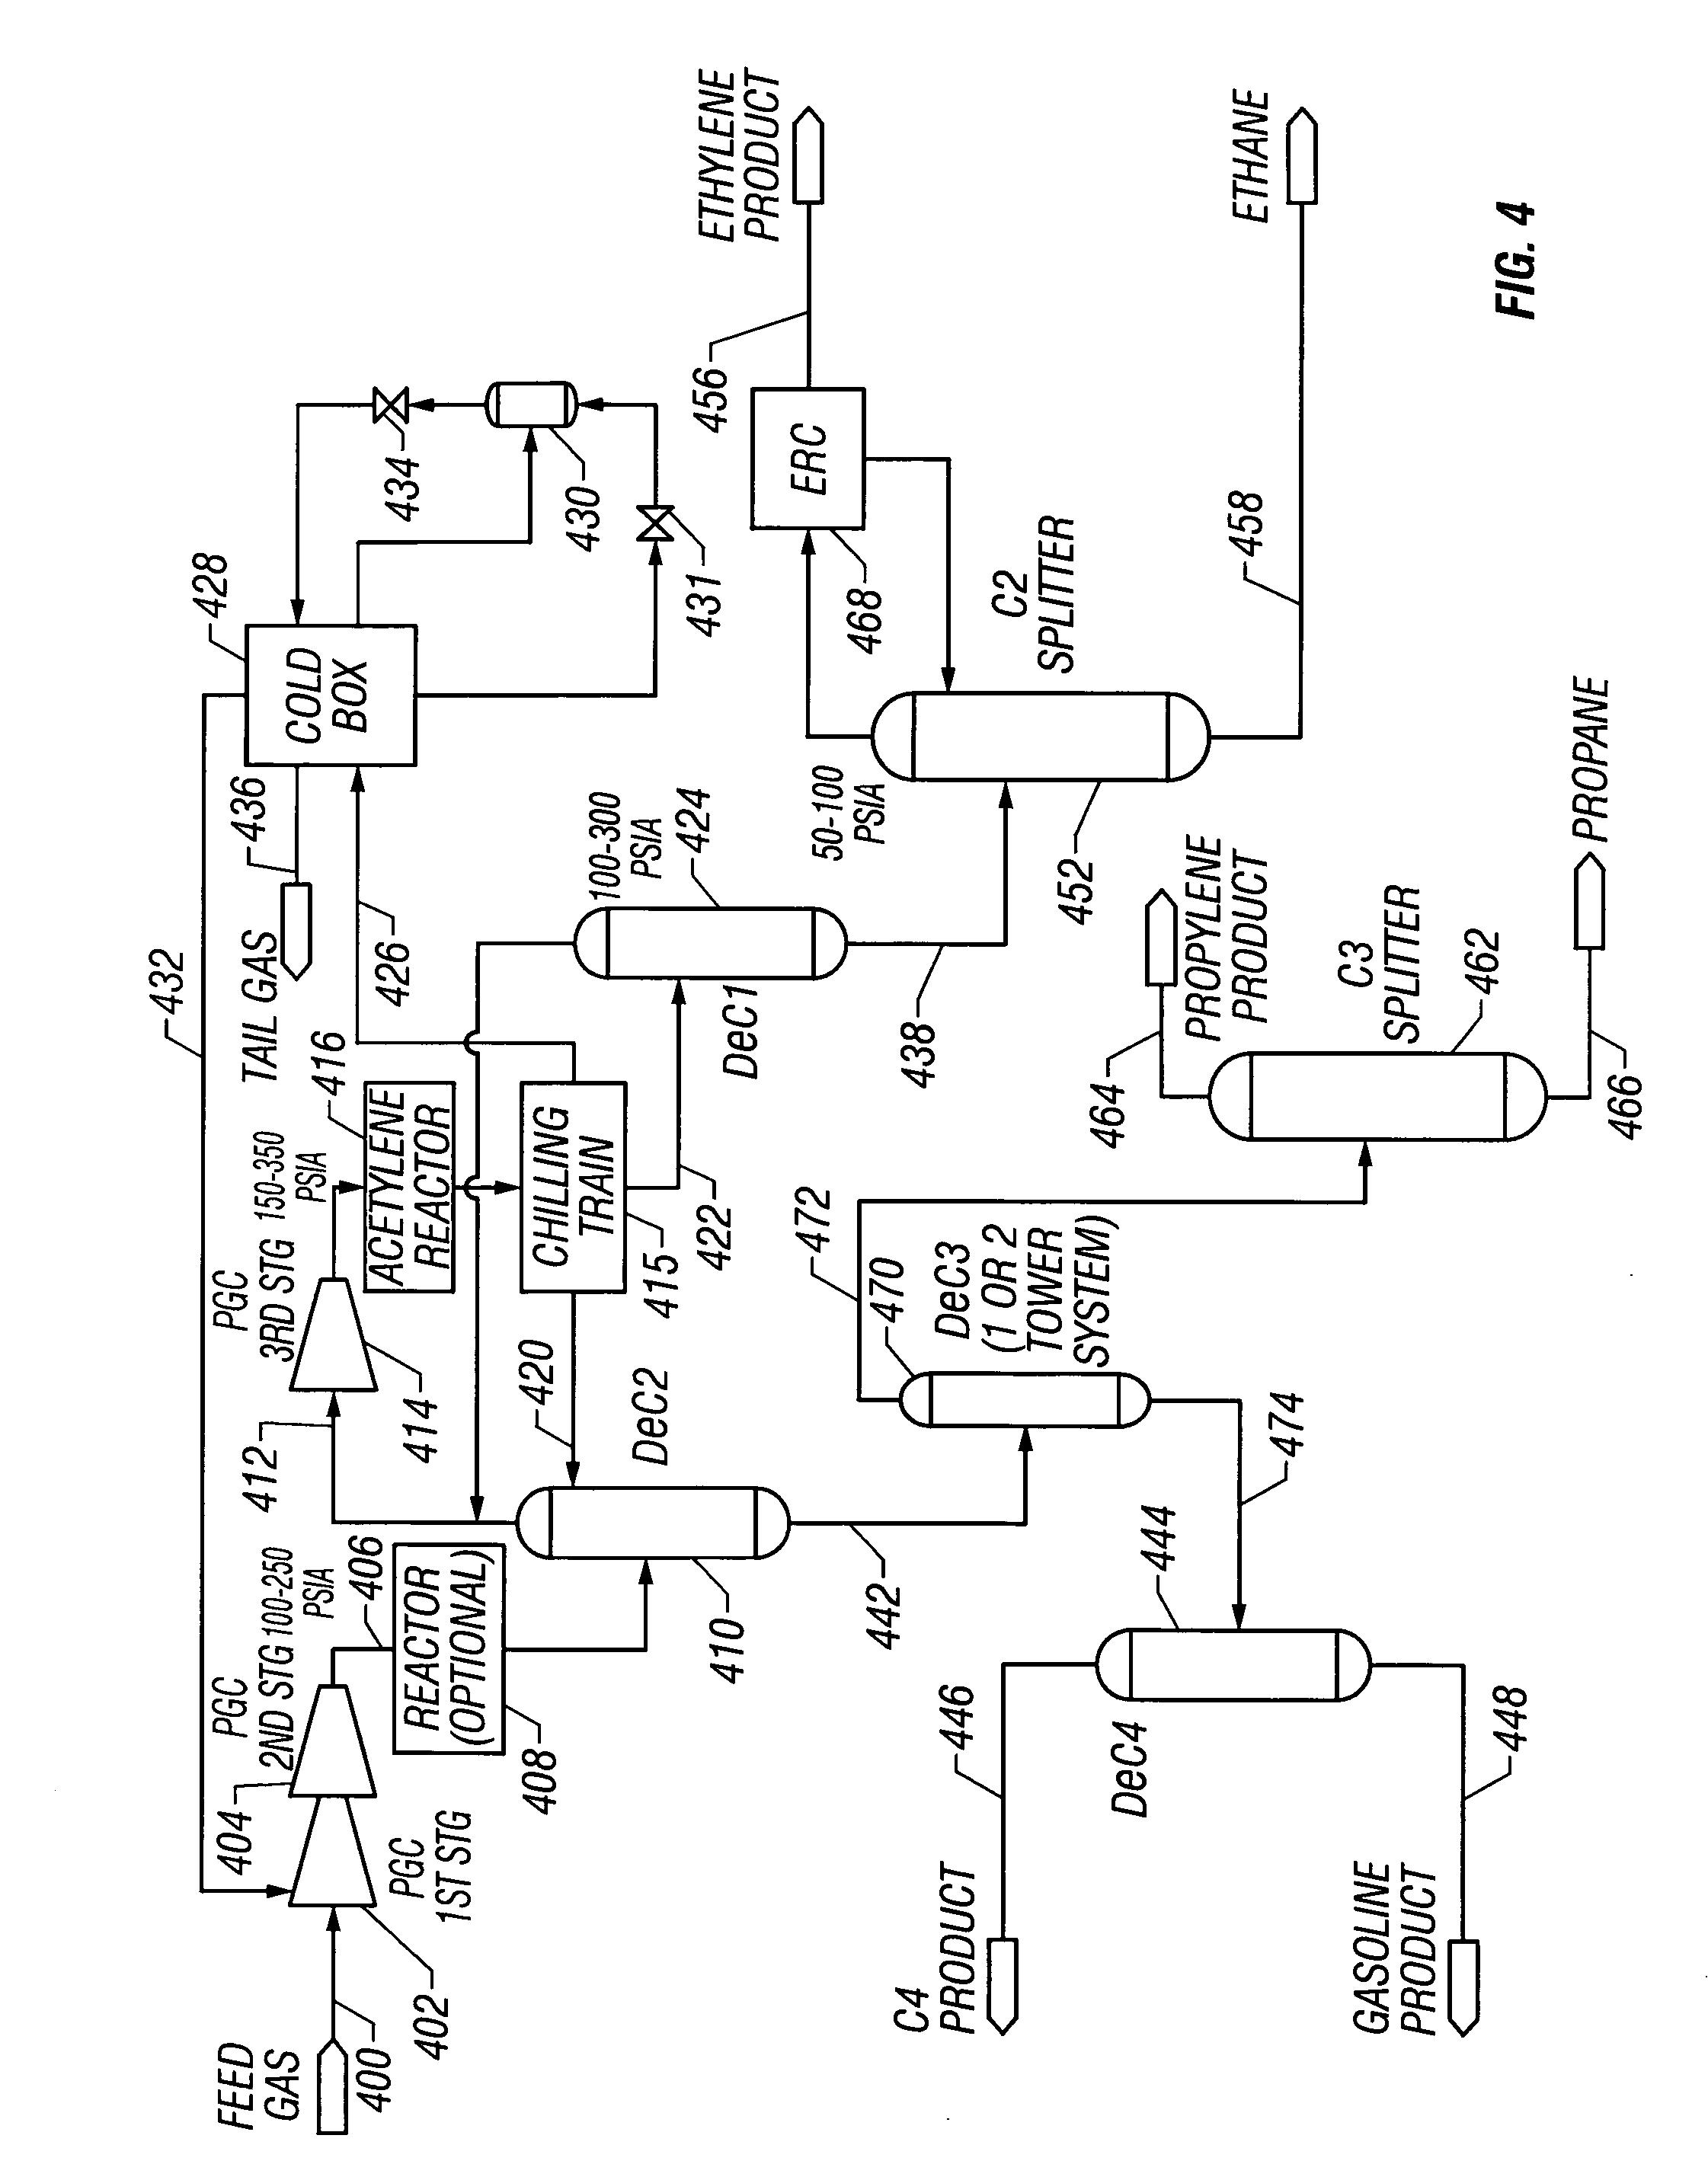 diagram of propane refrigeration process